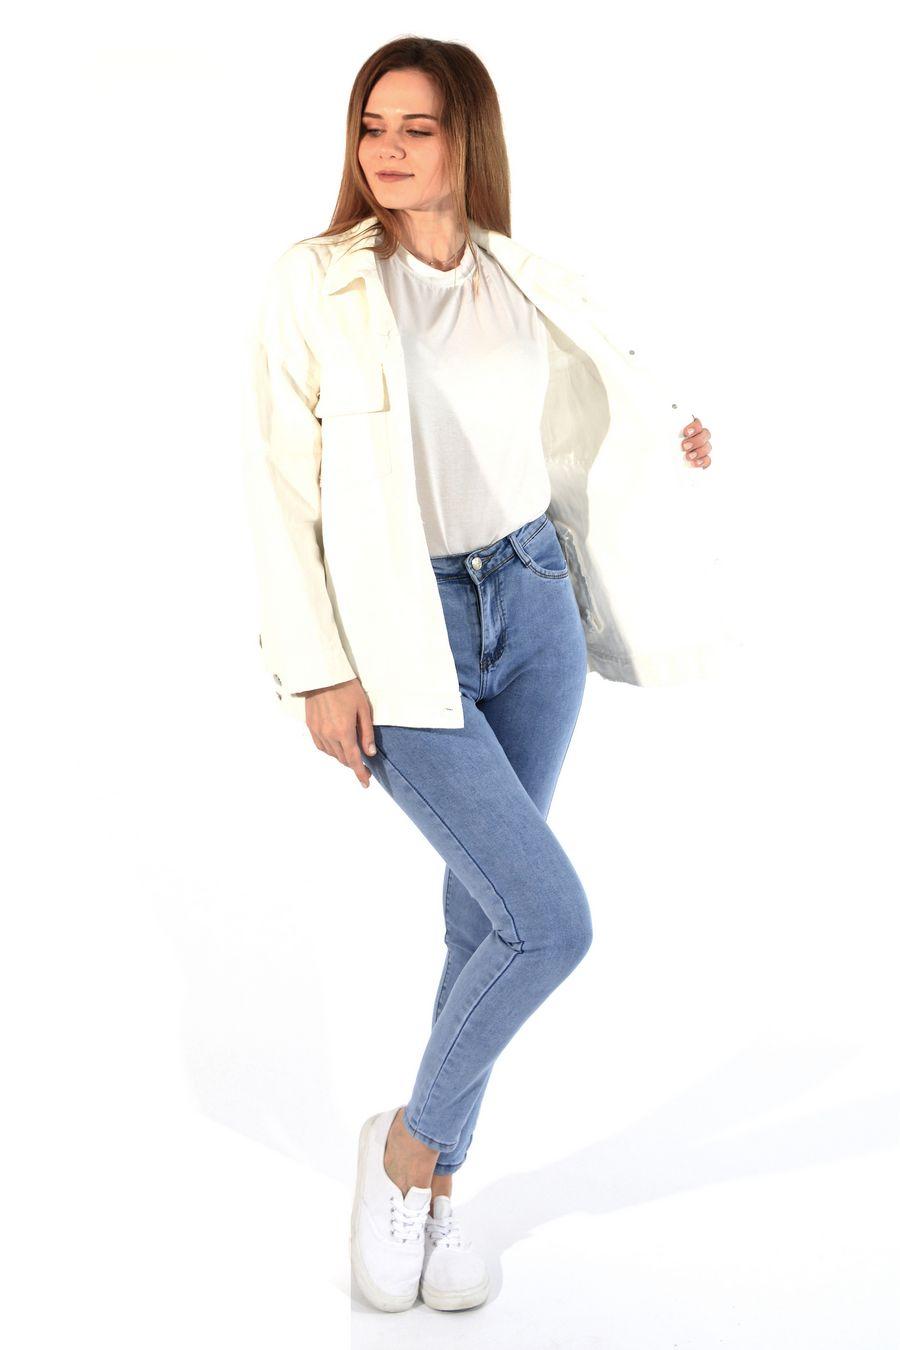 Жакет женский (джинсовка) LRZBS 955 - фото 4